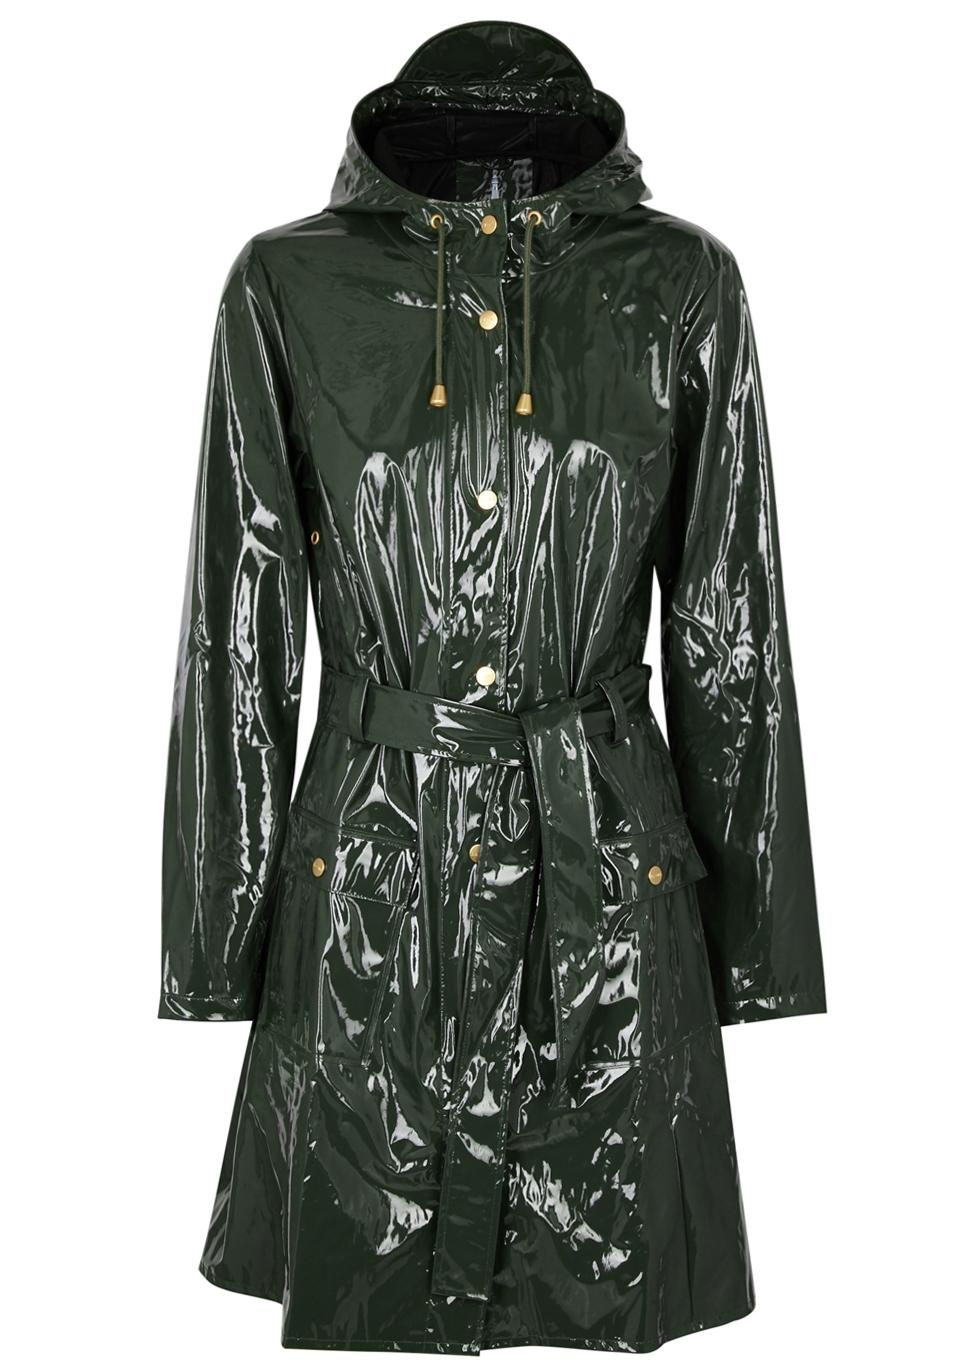 8504c63fc Designer Coats - Women s Winter Coats - Harvey Nichols